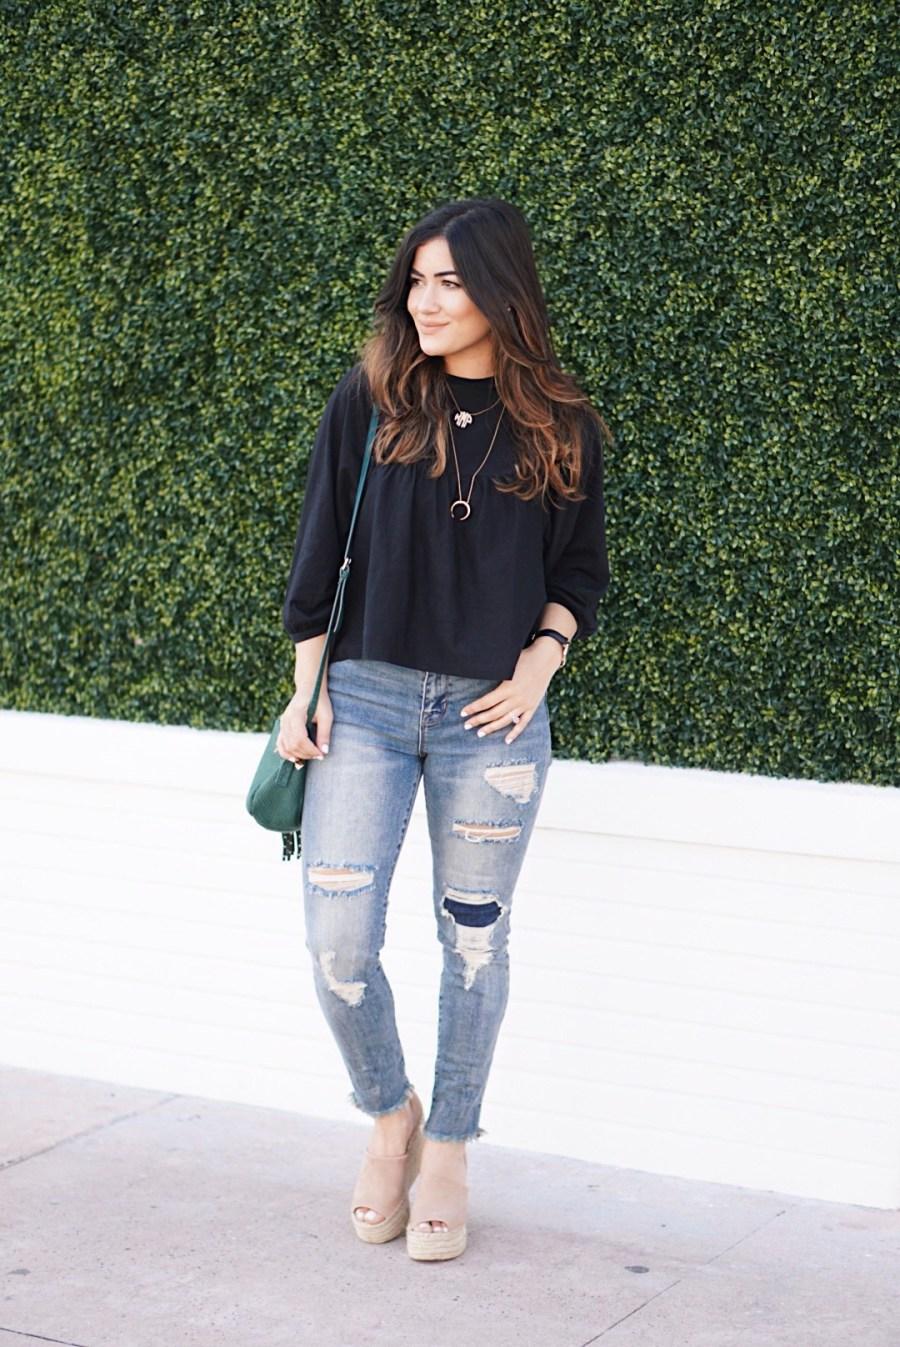 Here's Why I'm loving the Raw Hem Jean Trend